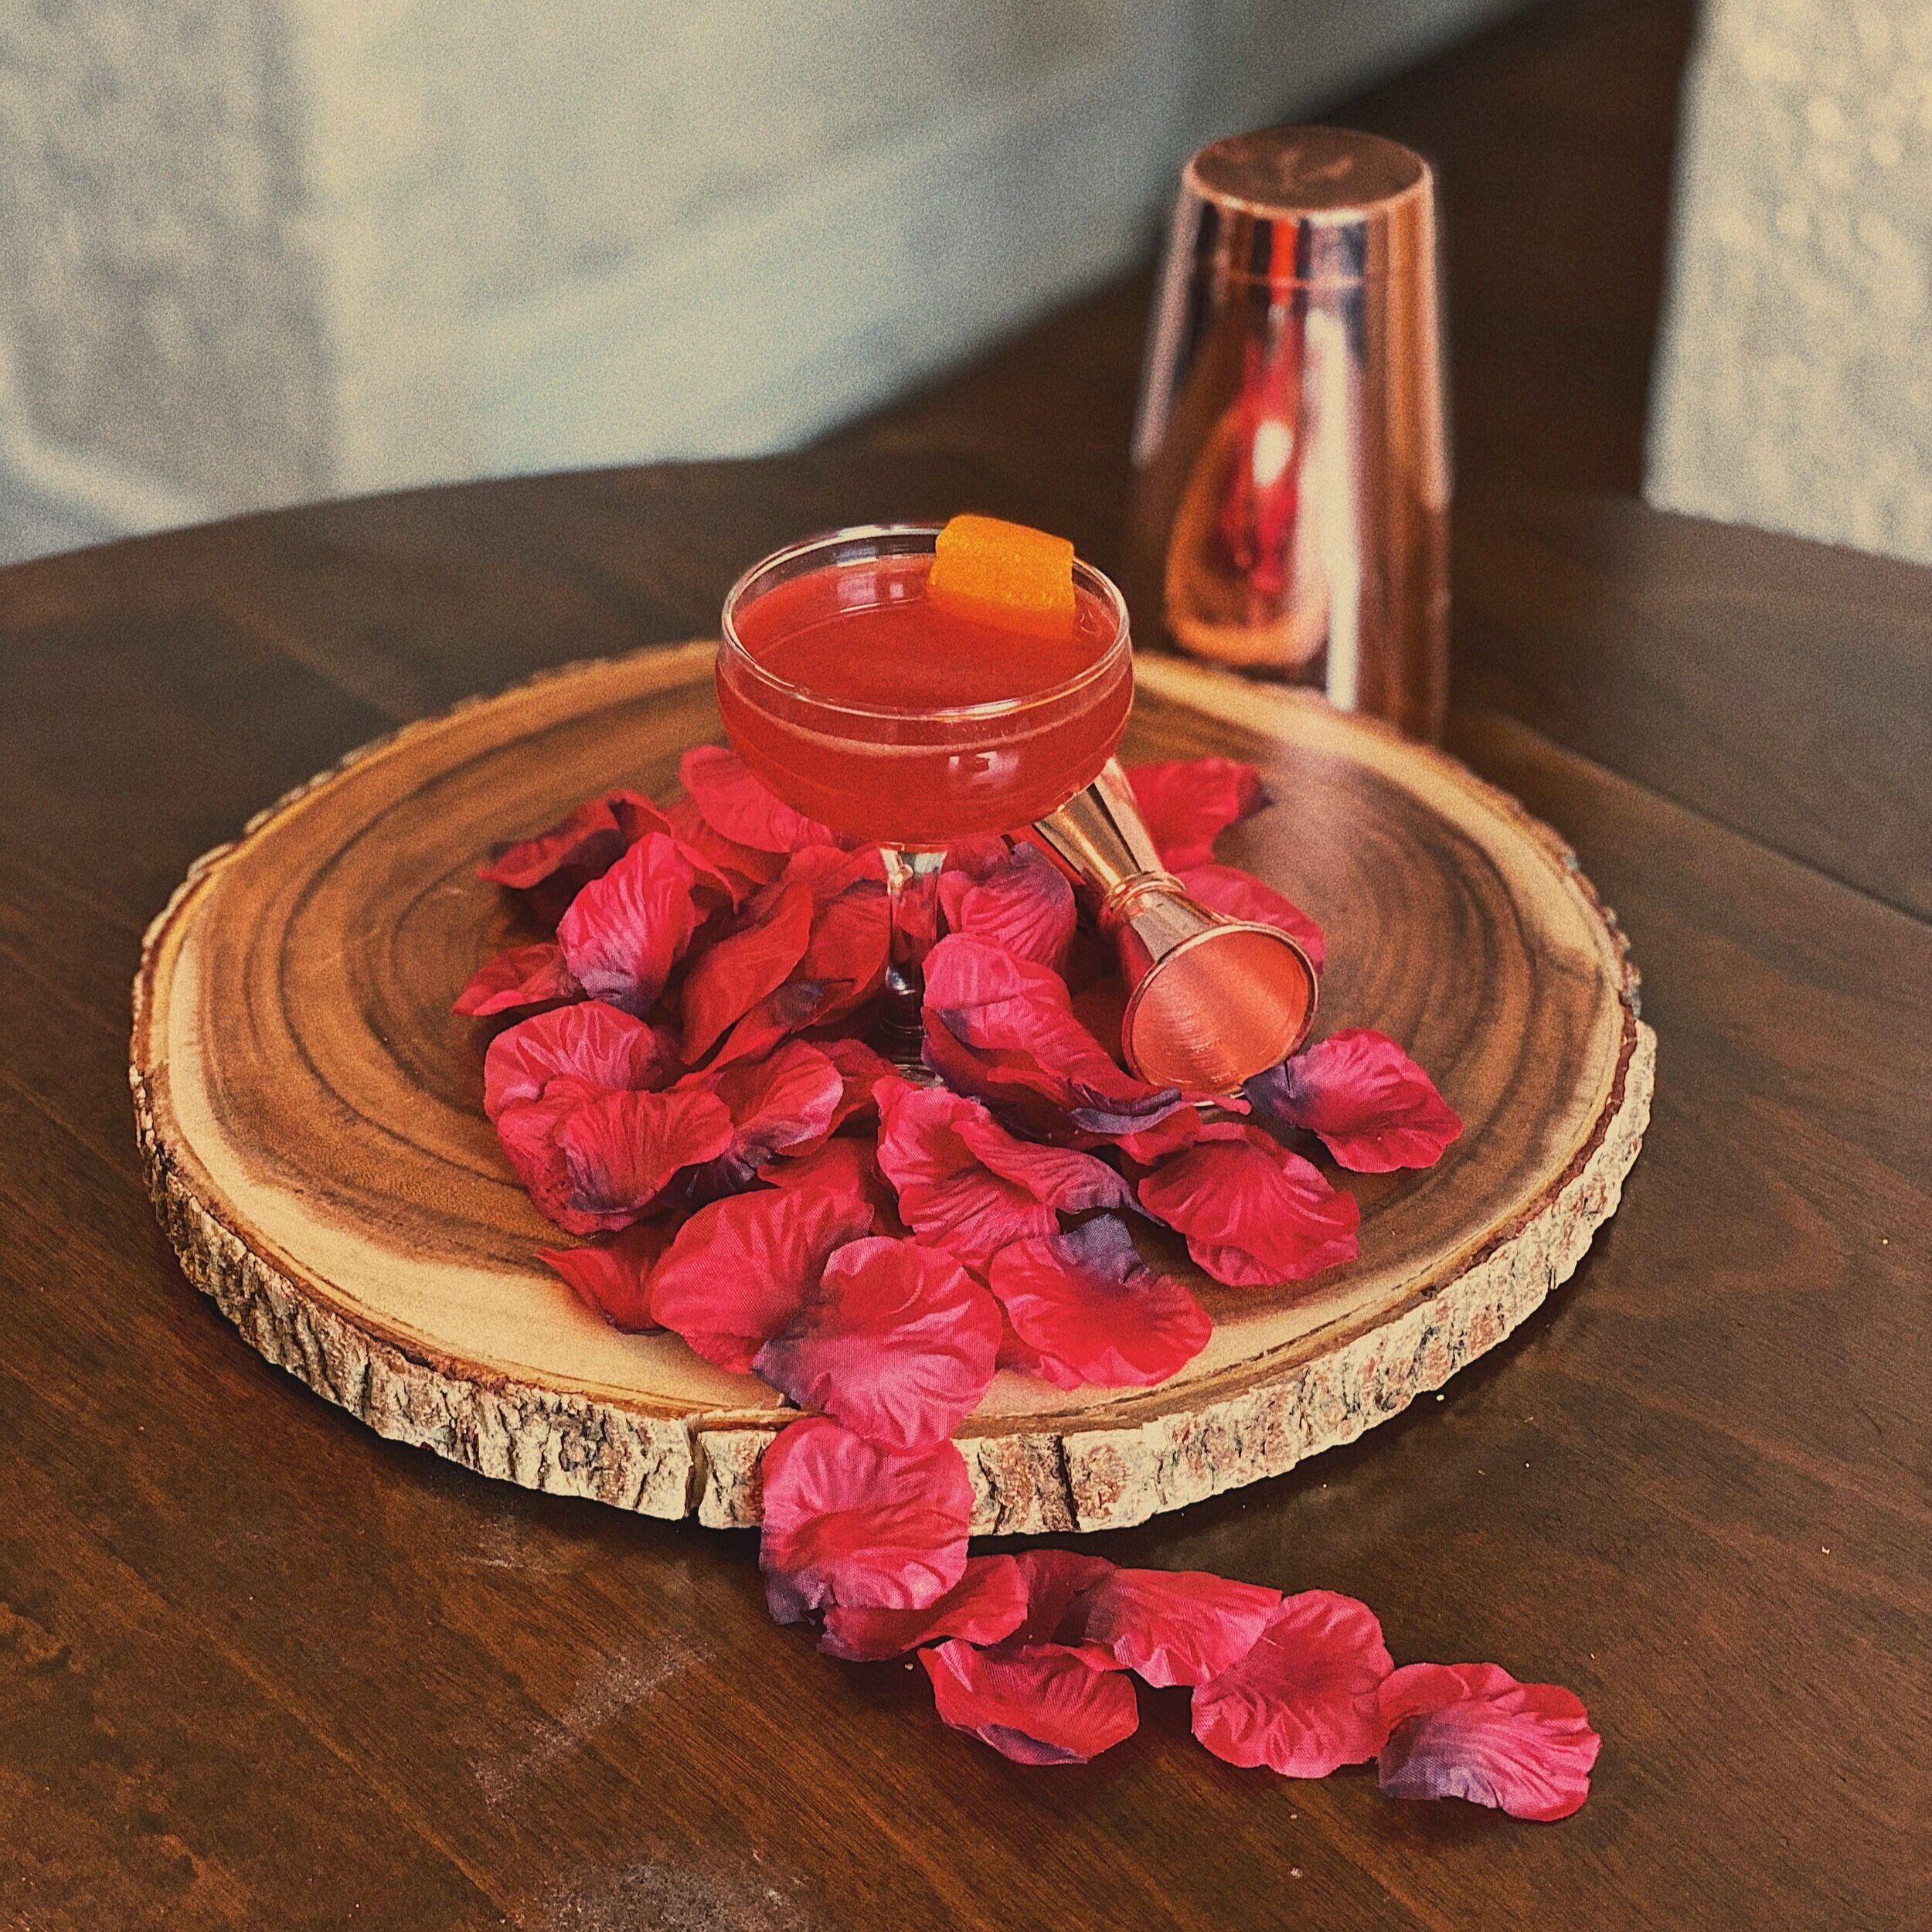 iSee Full Framed Prescription Glasses From $90 | Pink ... |Rose Colored Glasses Readers